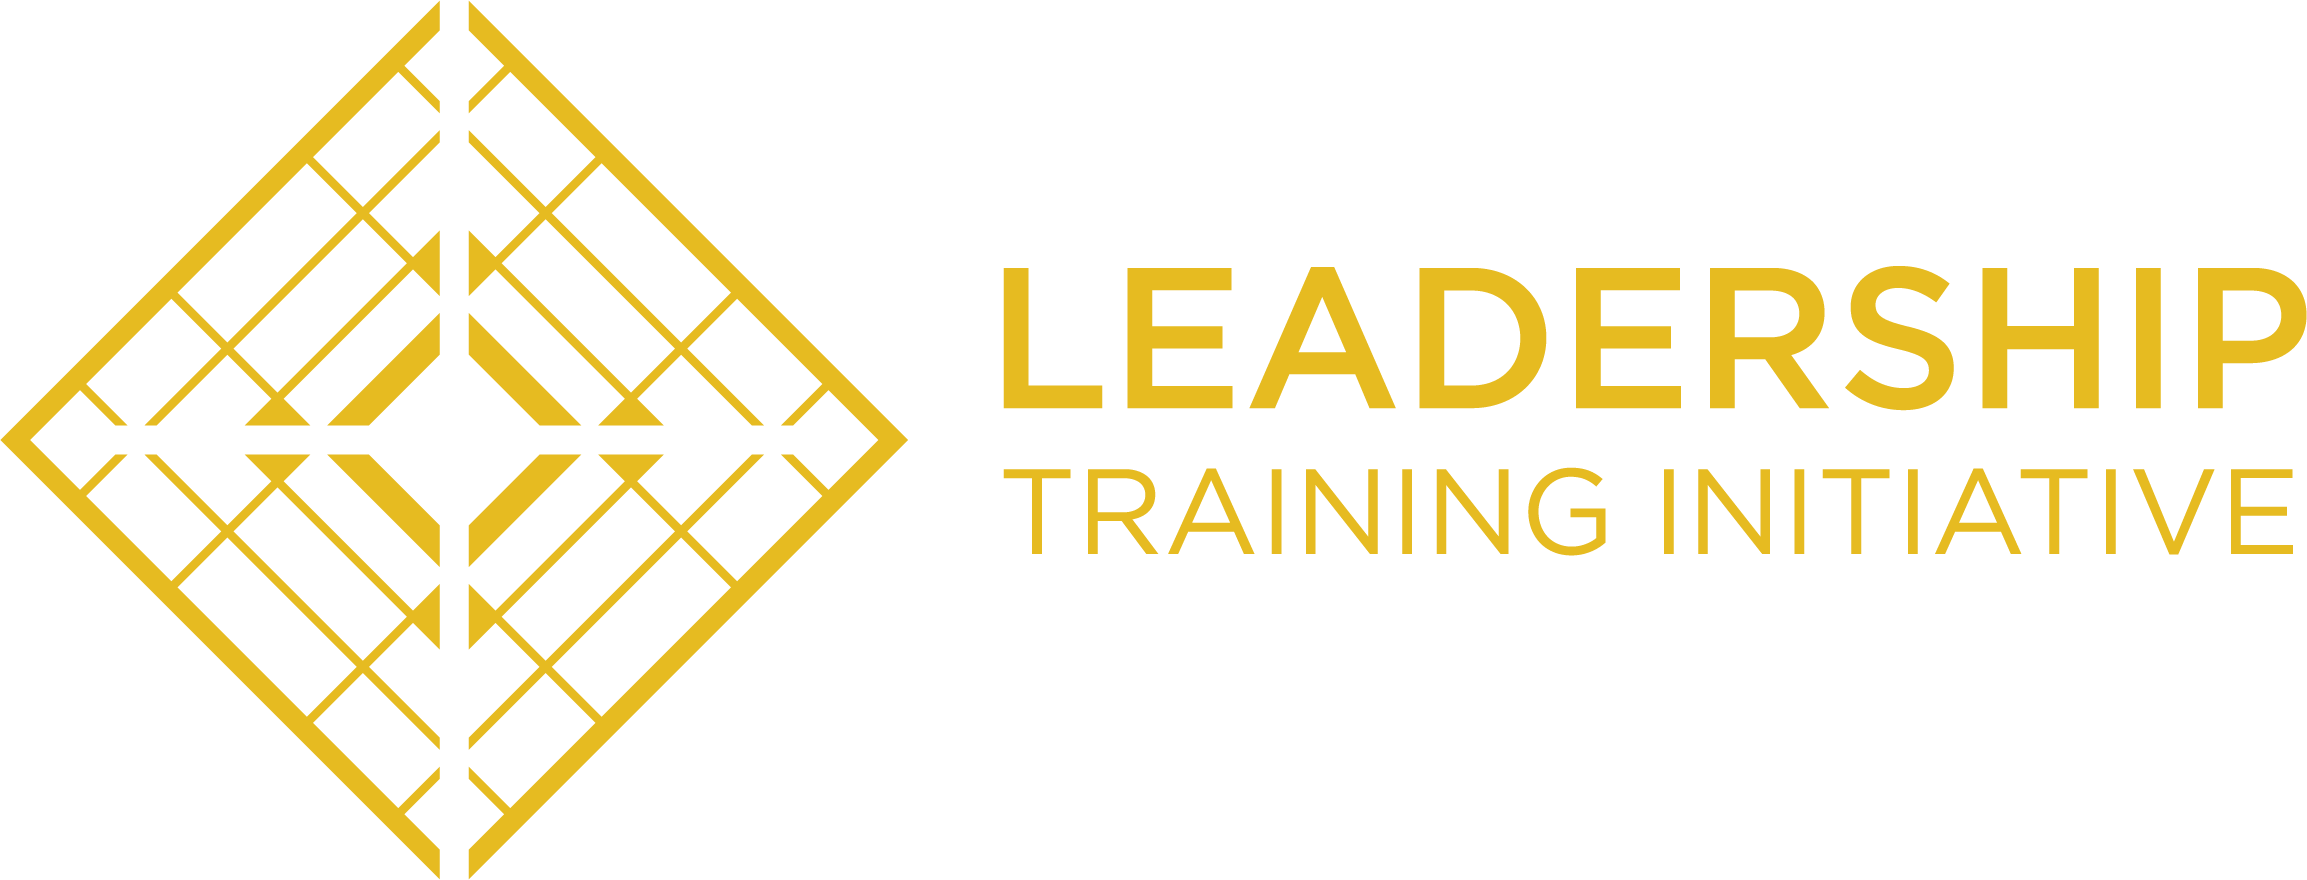 Leadership Training Initiative